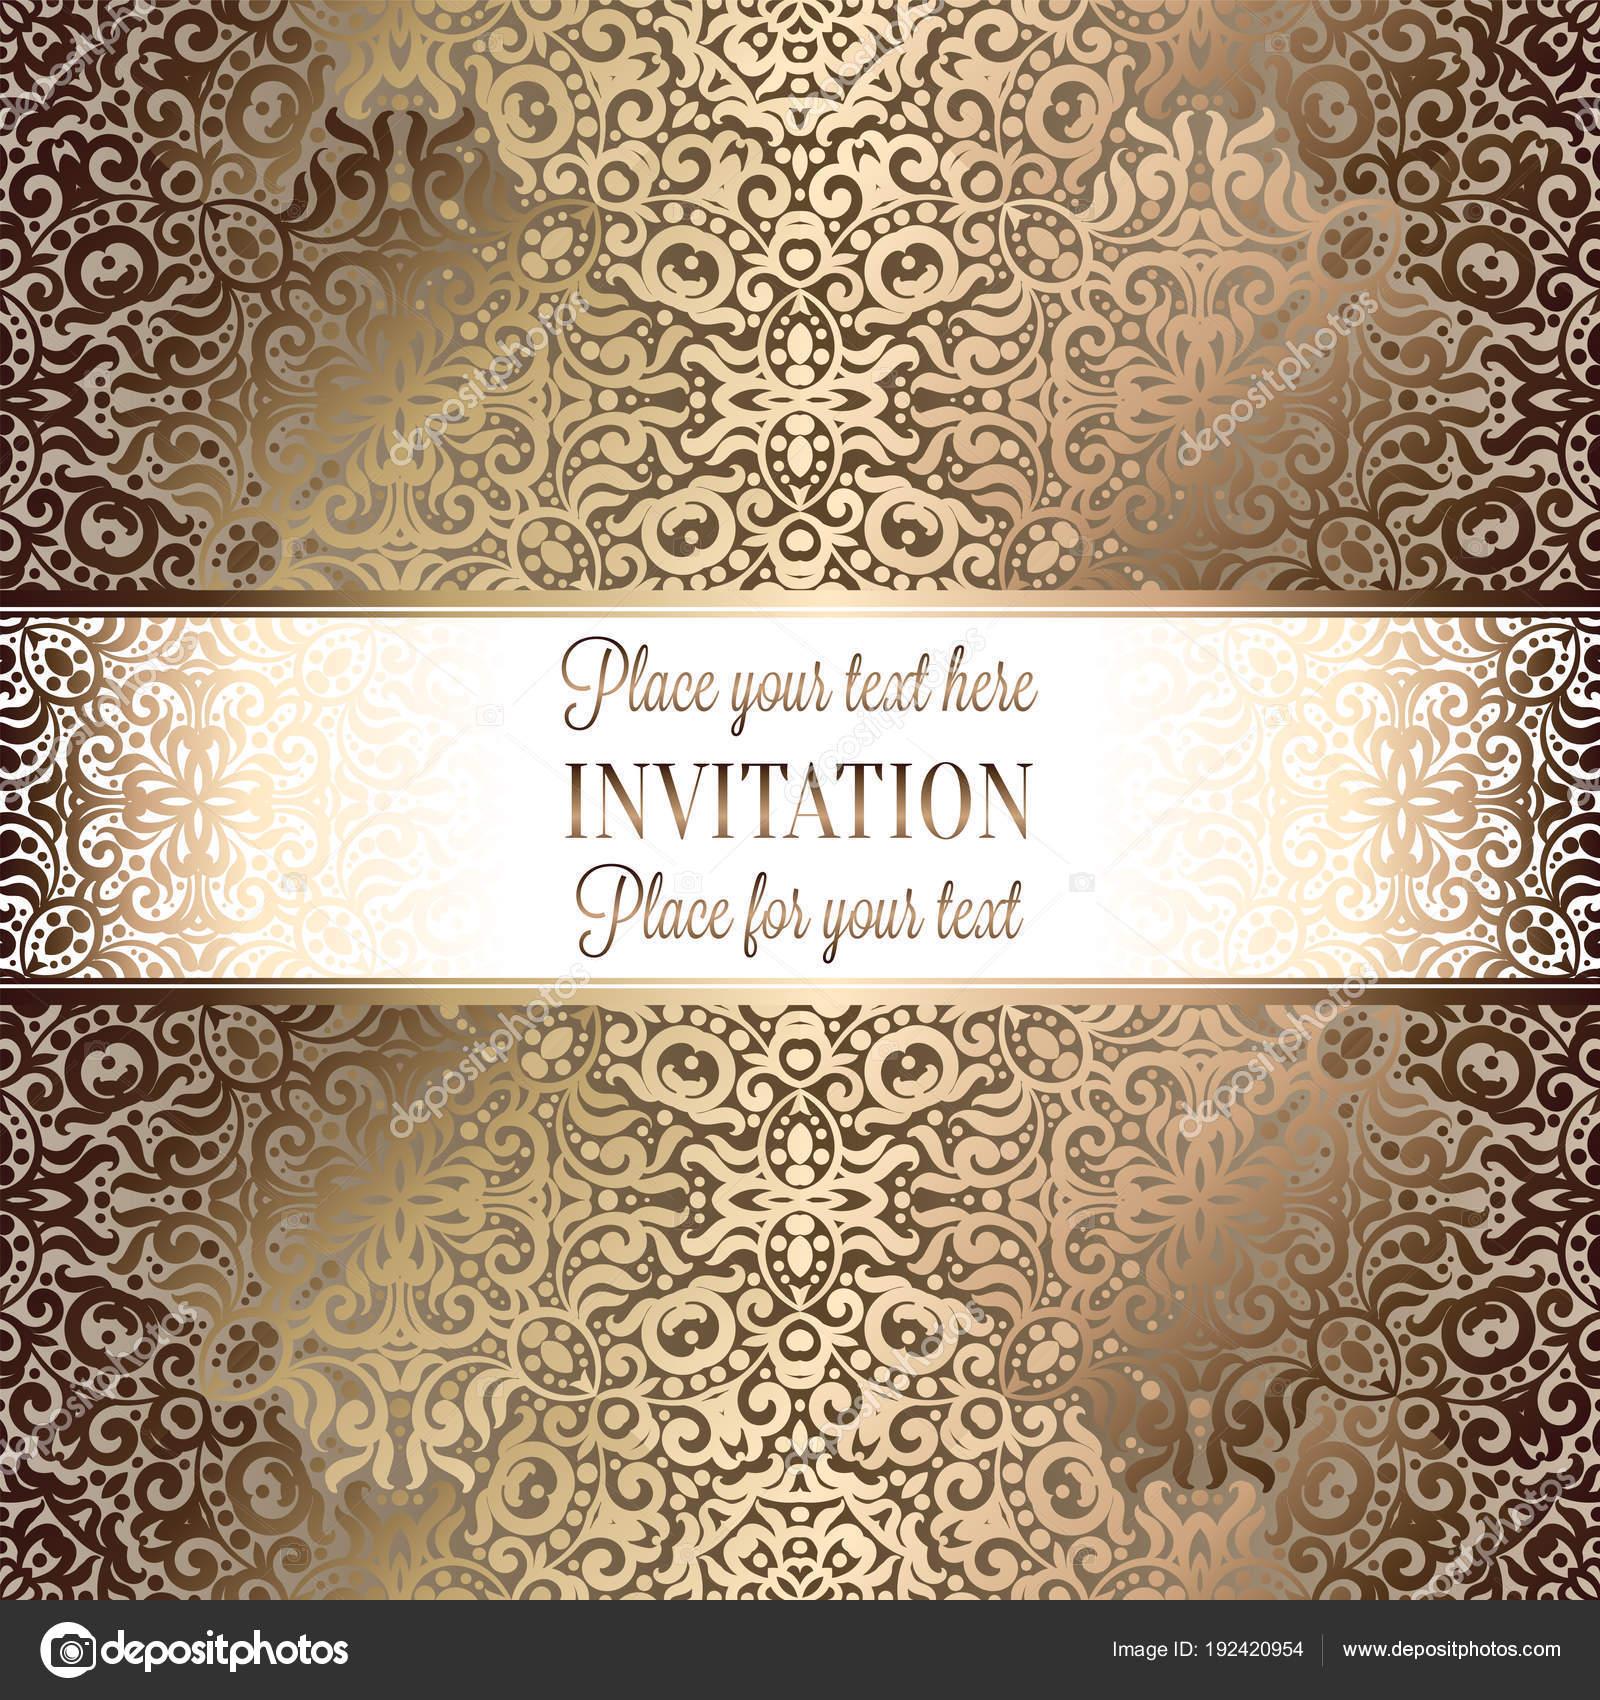 Diseno Plantilla Tarjeta Oro Invitacion Boda Con Patron Damasco - Fondo-invitacion-boda